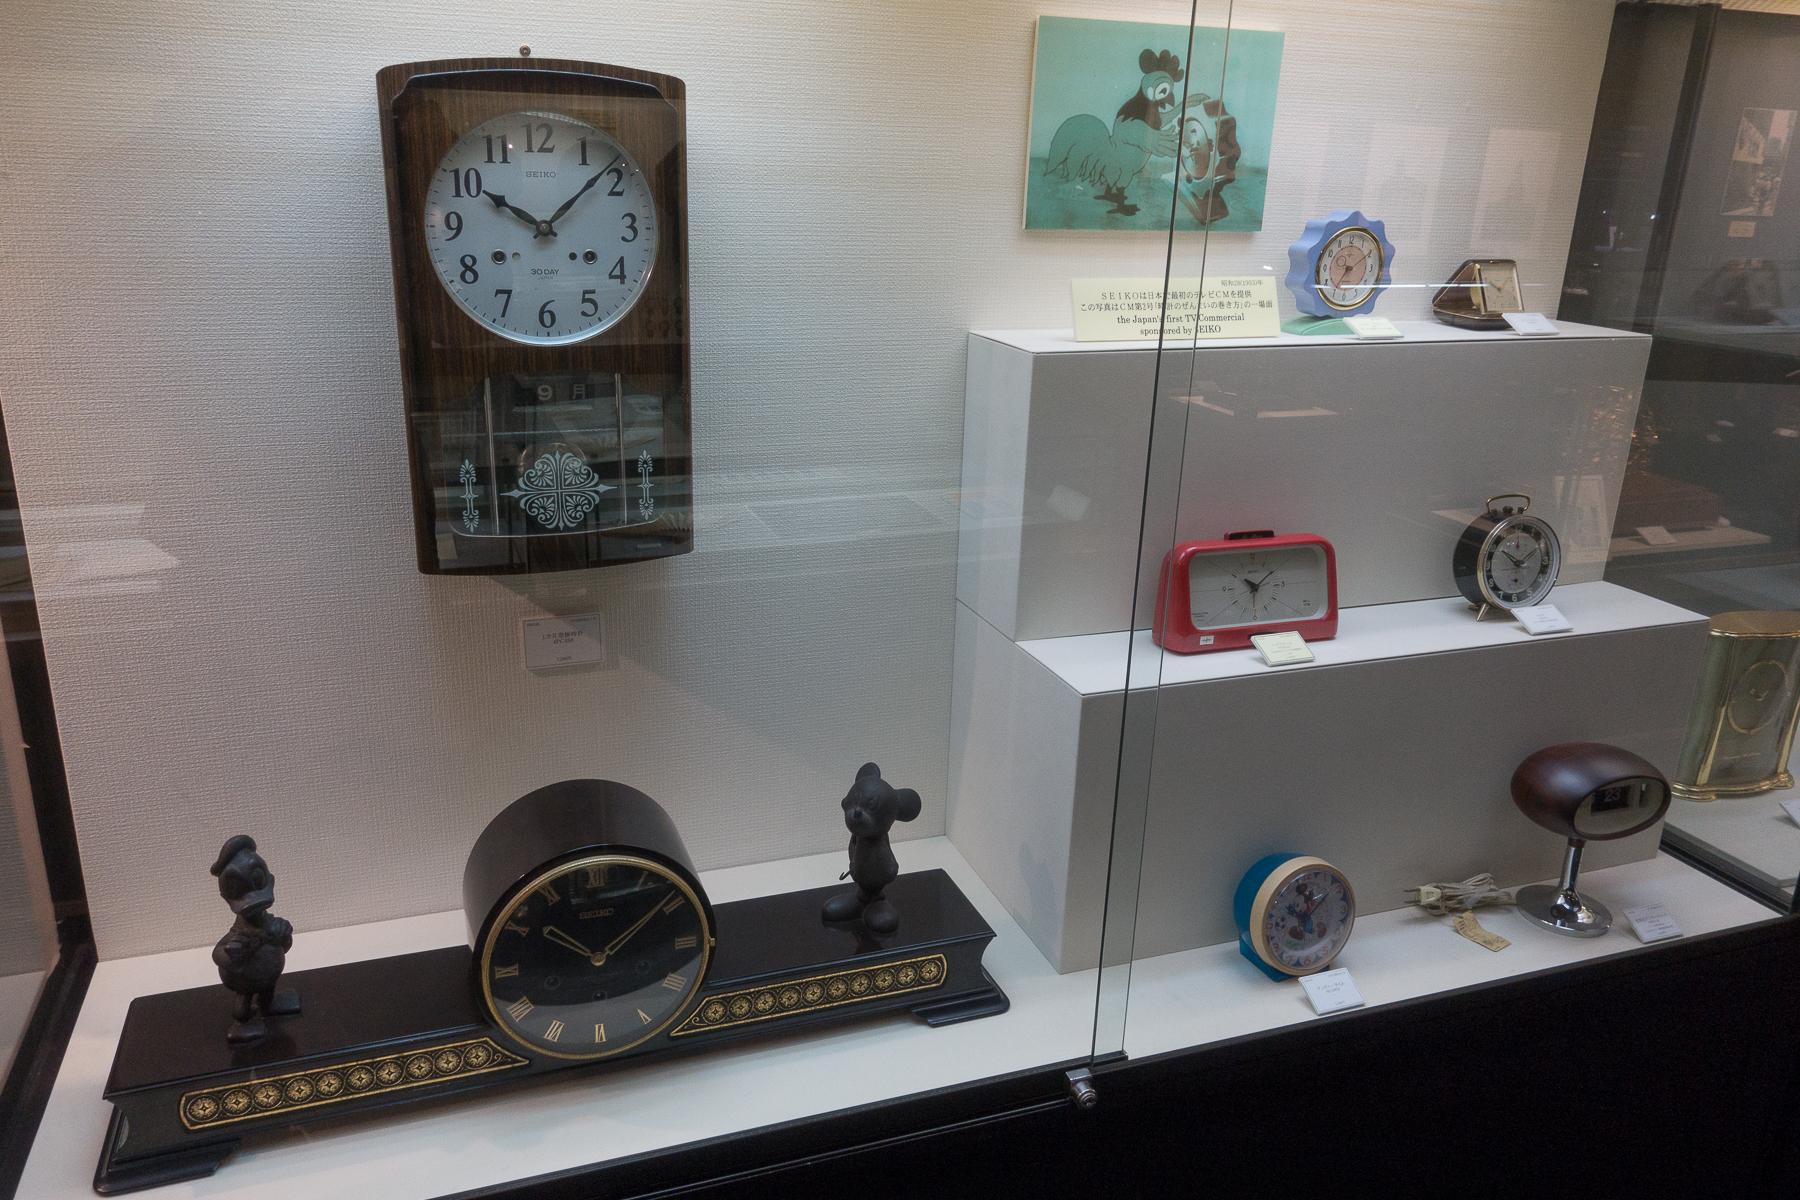 30 Day, Disney and Desk clocks